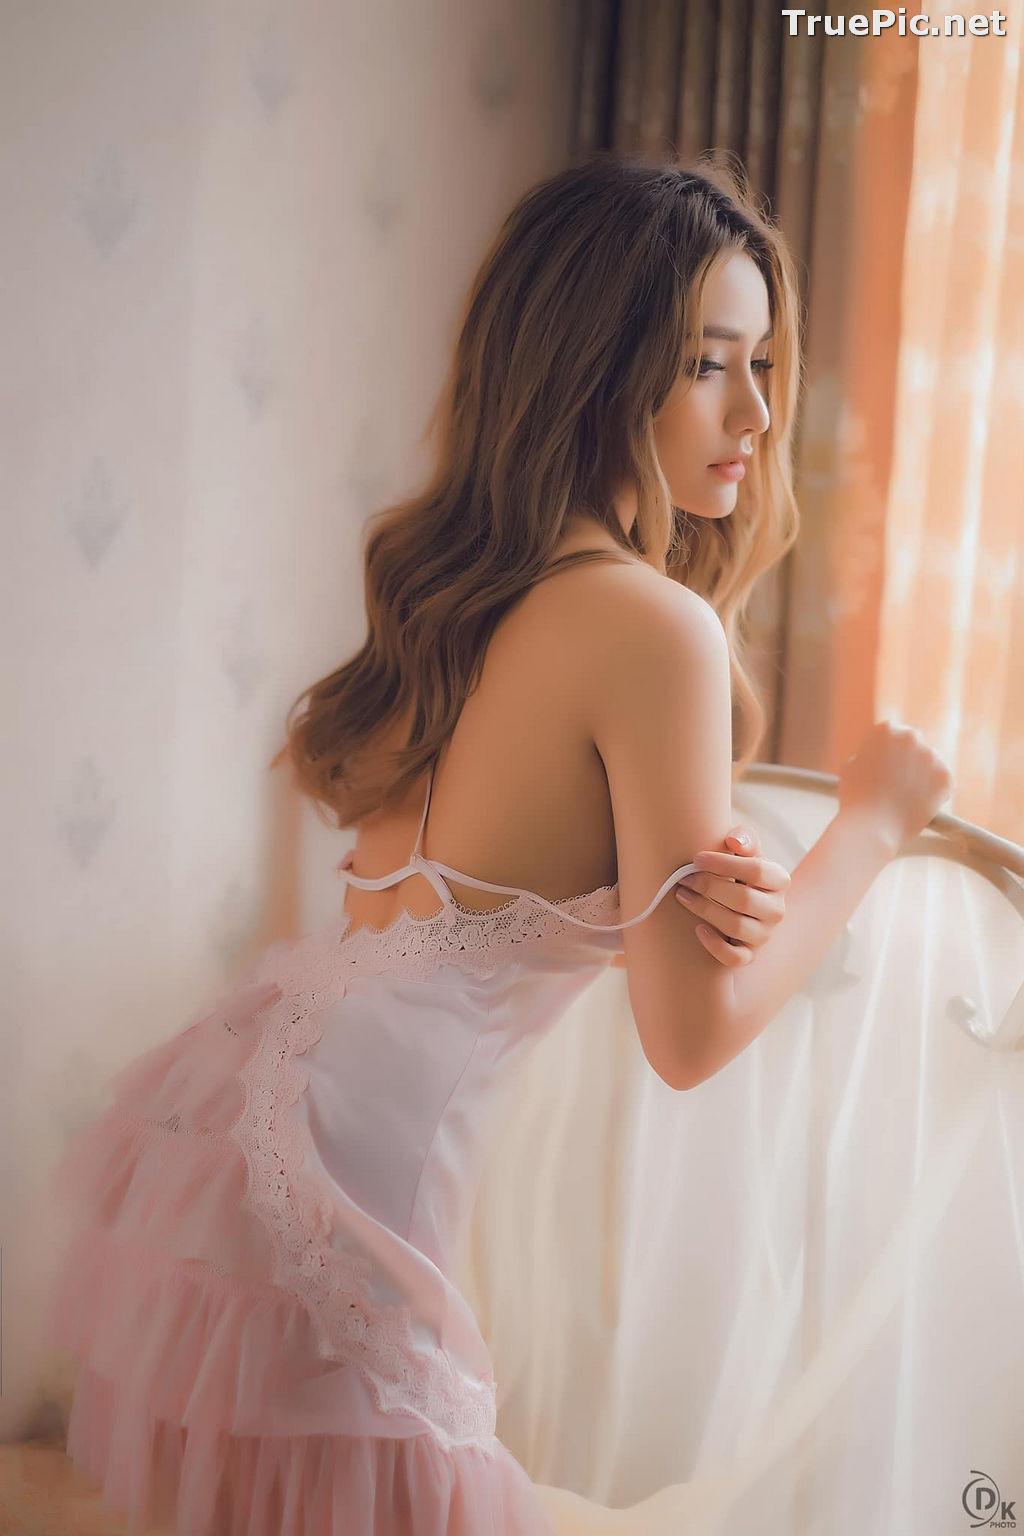 Image Vietnamese Hot Girl - Nguyen Thi Phi Yen - Sexy Beauty Of DJ Girl - TruePic.net - Picture-4